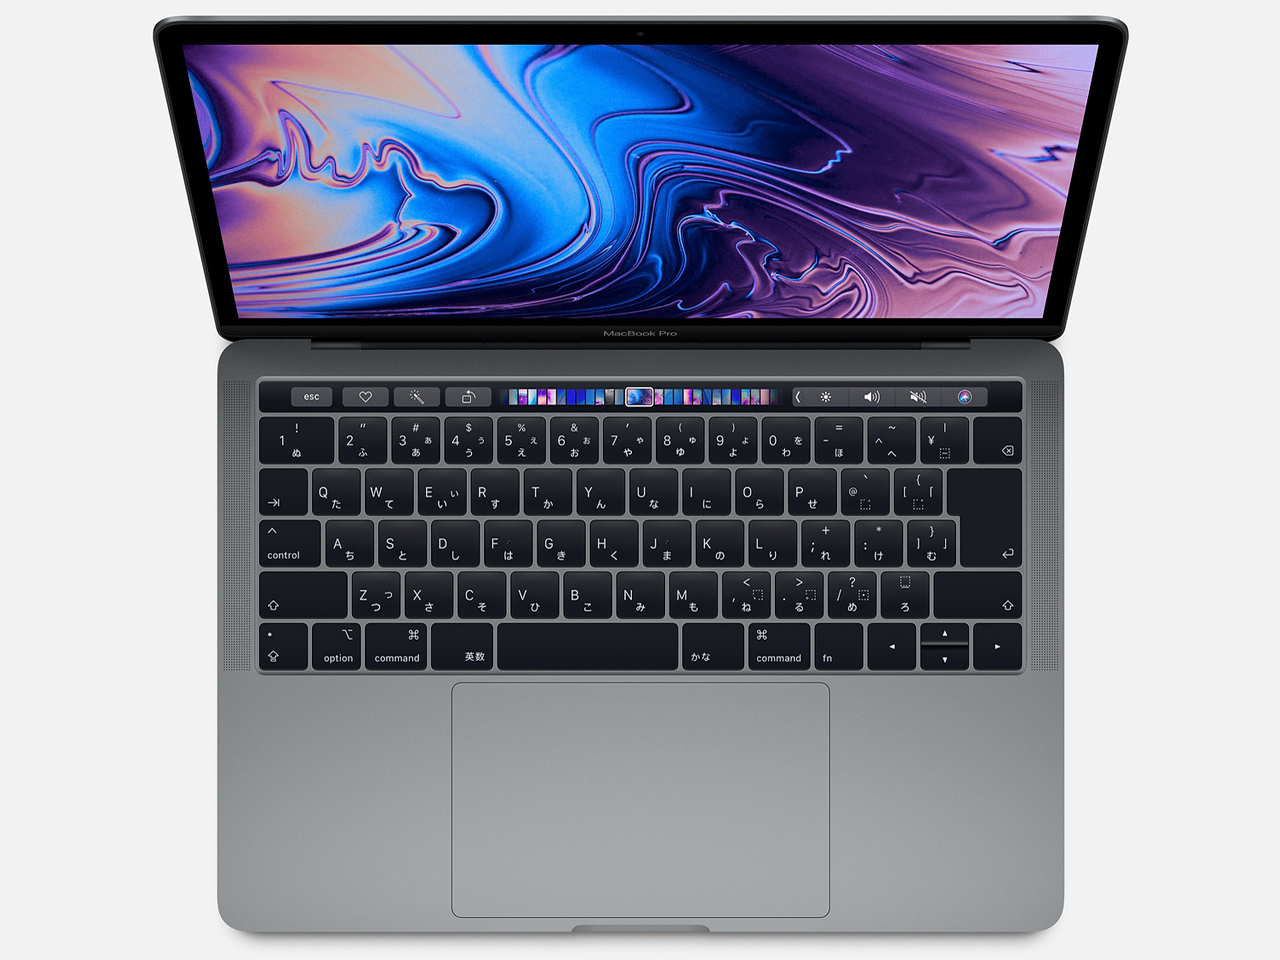 MacBook Pro (Retina, 13.3-inch, SSD 512GB, Touch Bar, 2019) MV972J/A スペースグレイ